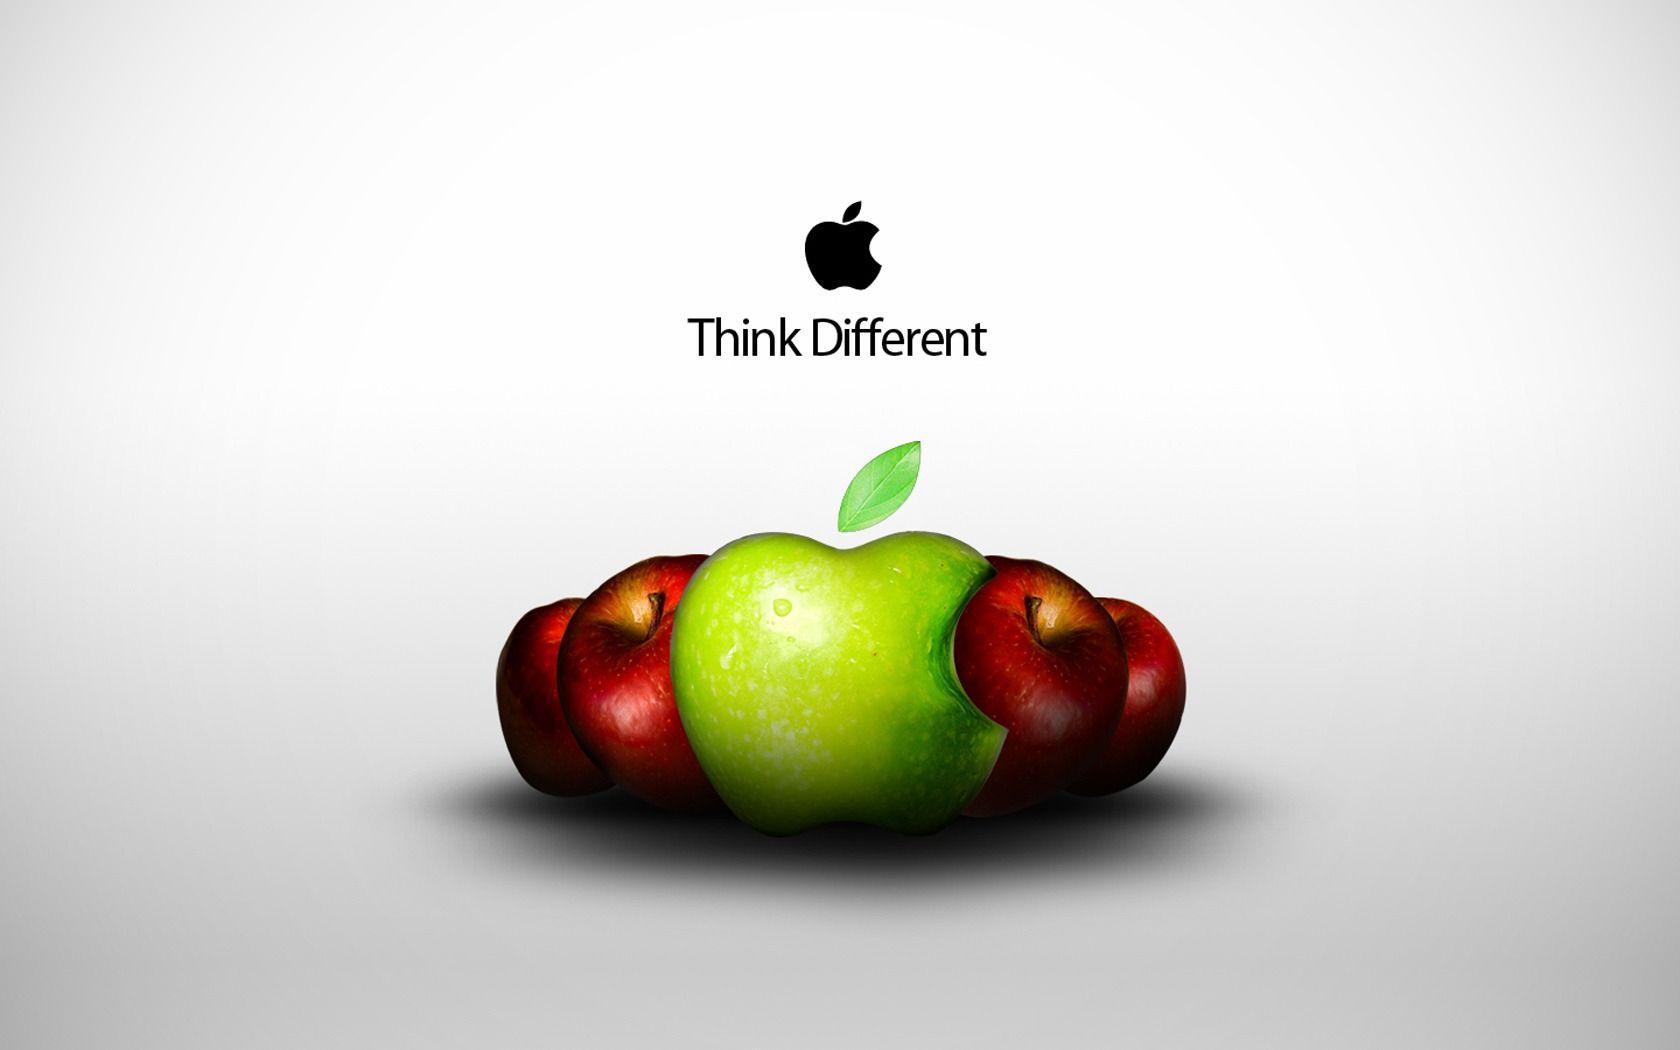 apple logo ipad wallpaper disney